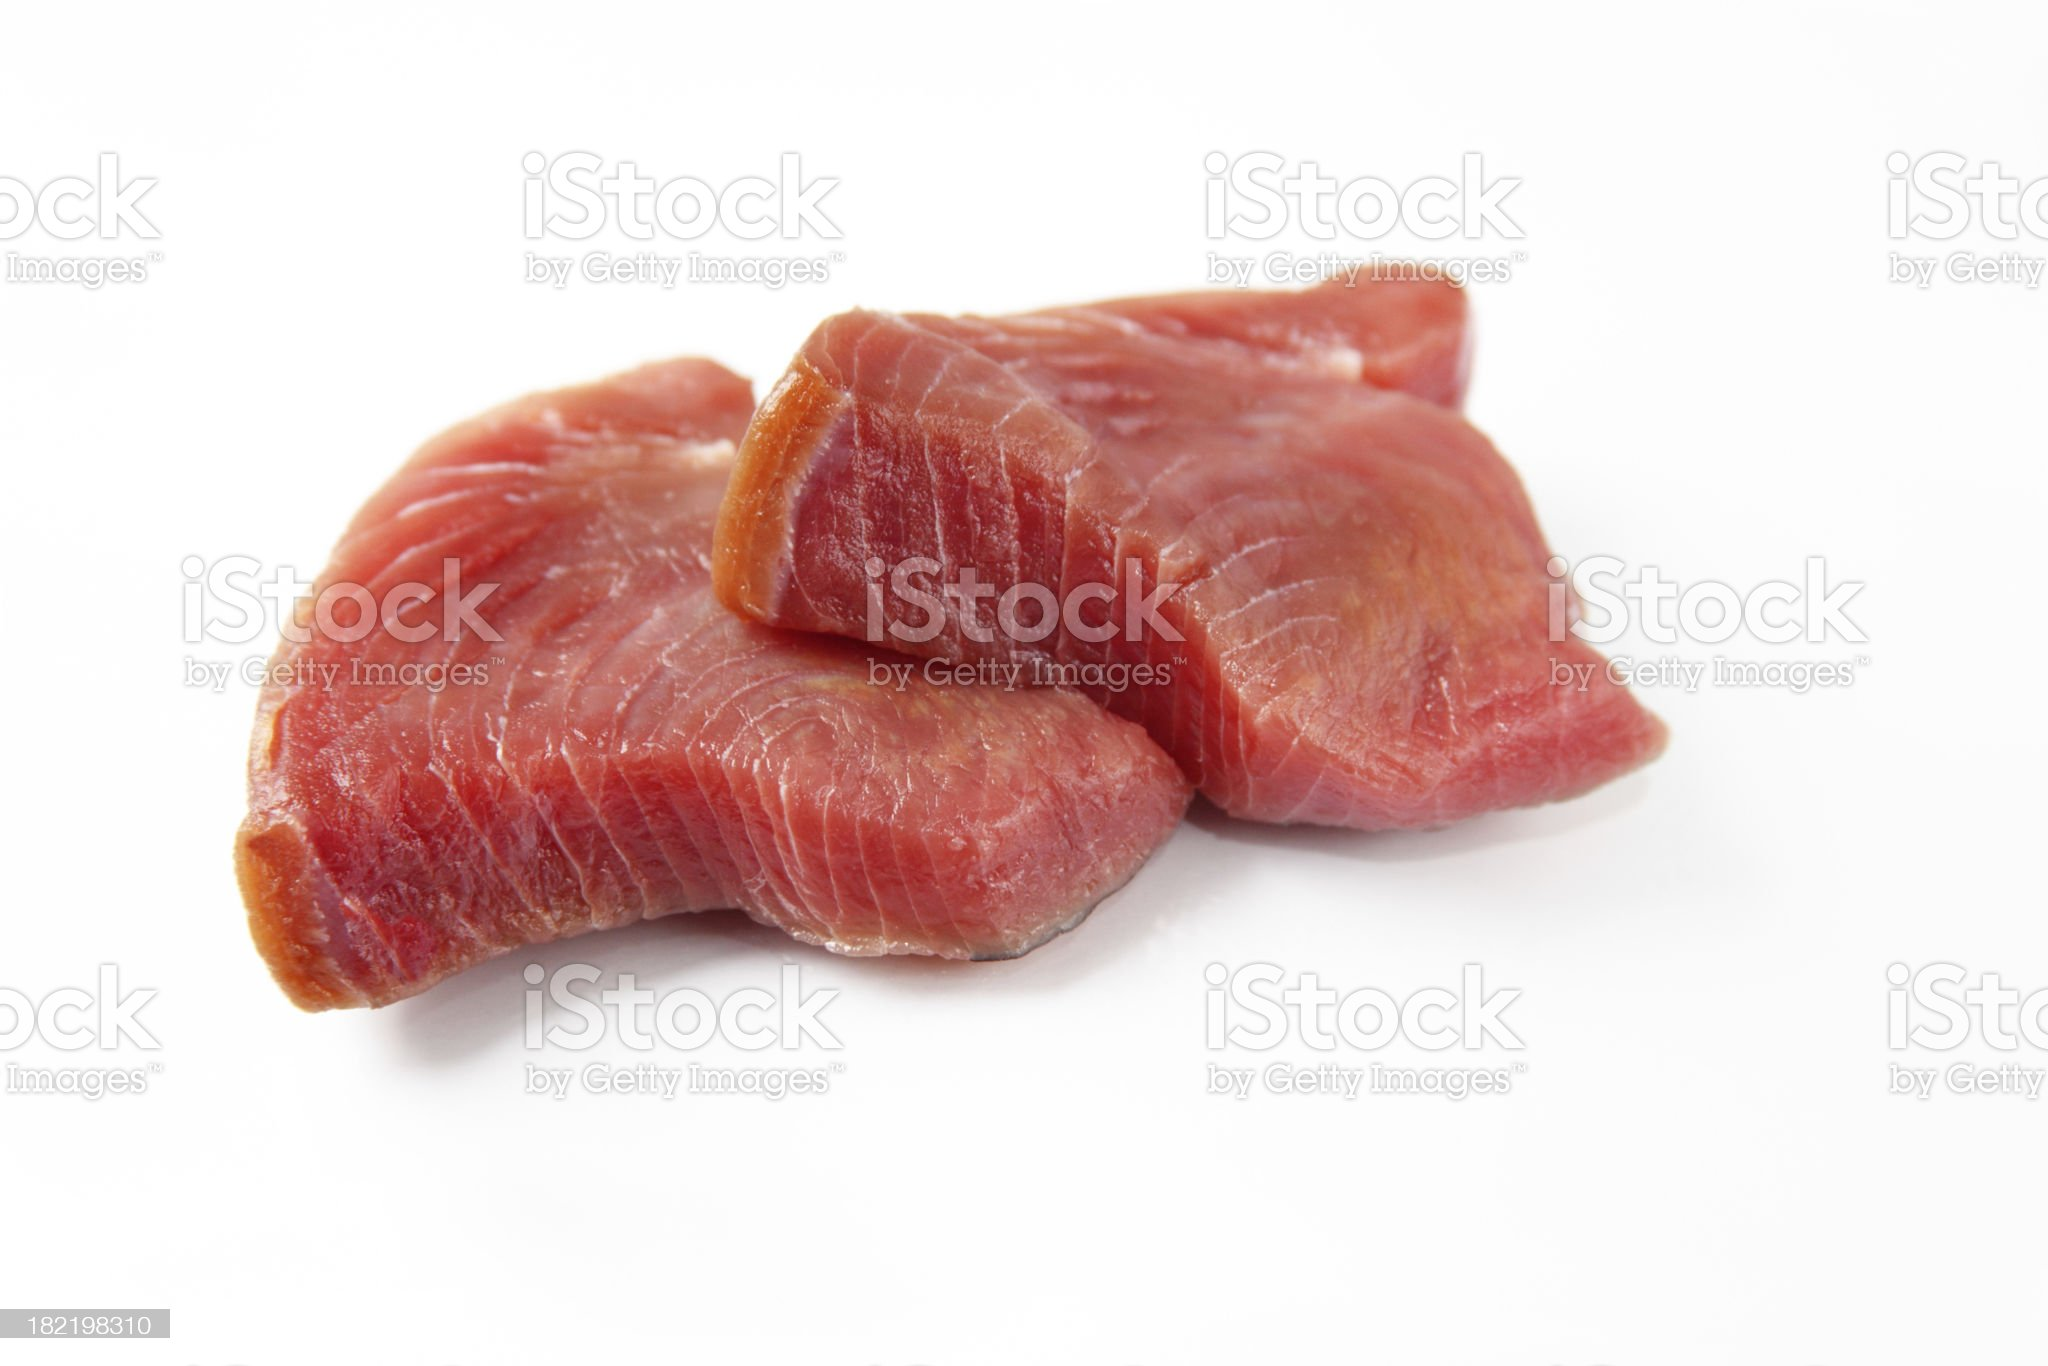 Tuna steaks royalty-free stock photo